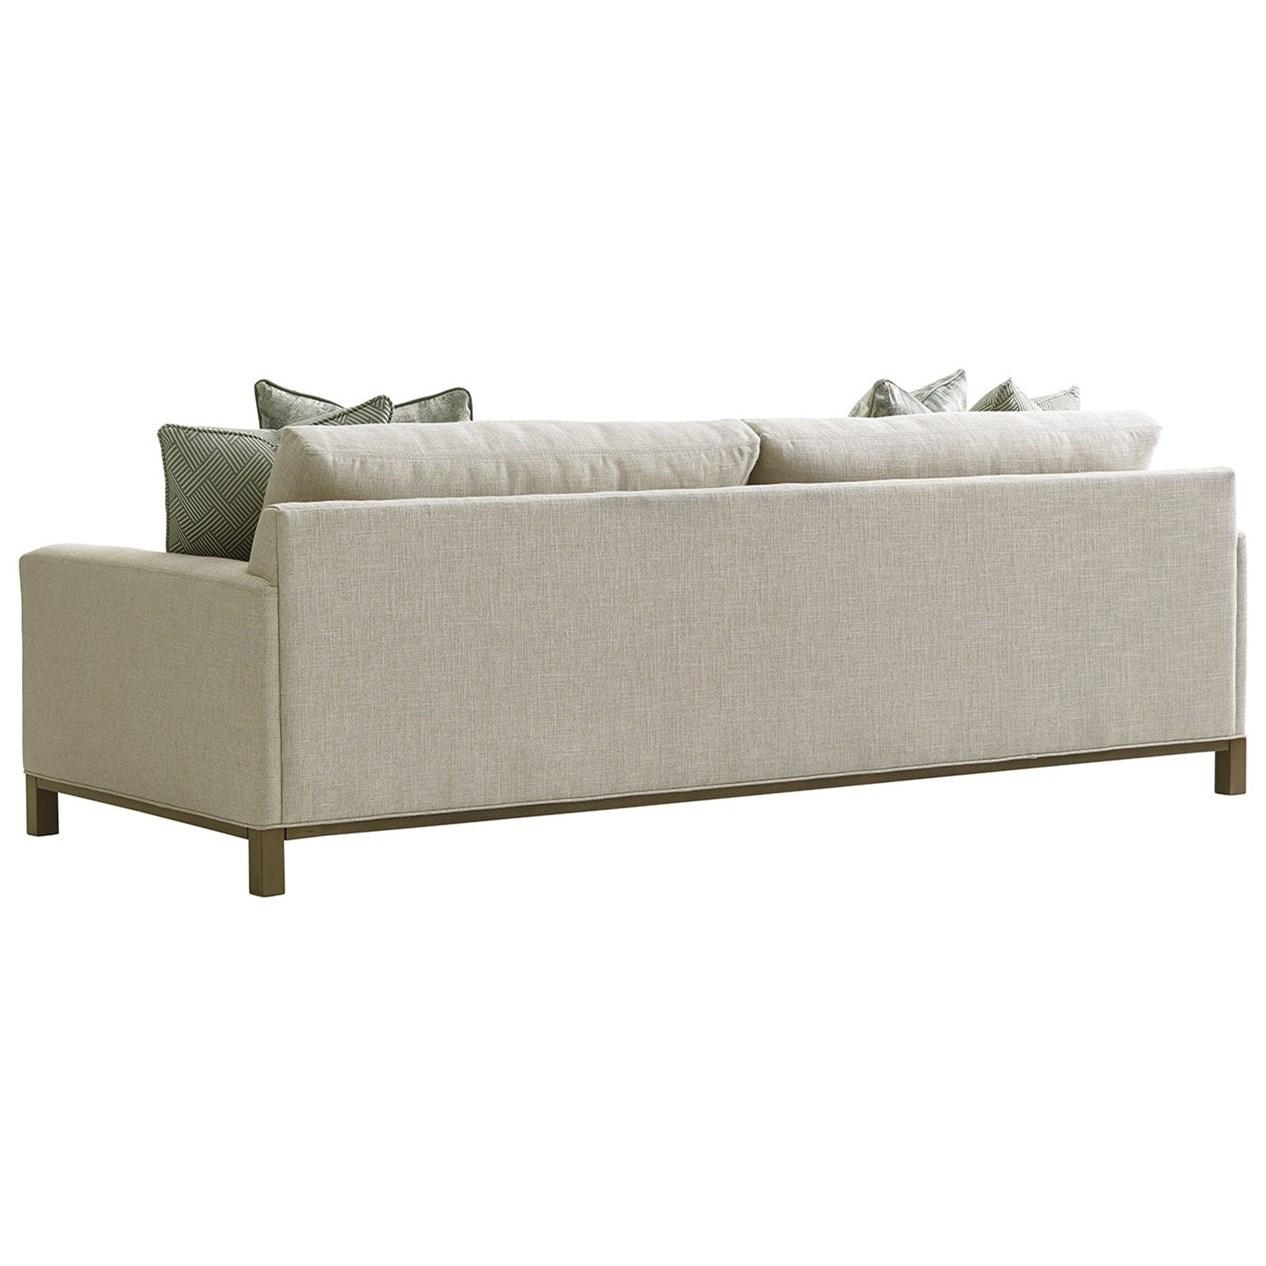 lexington sectional sofa chippendale mahogany camelback upholstery chronicle stationary